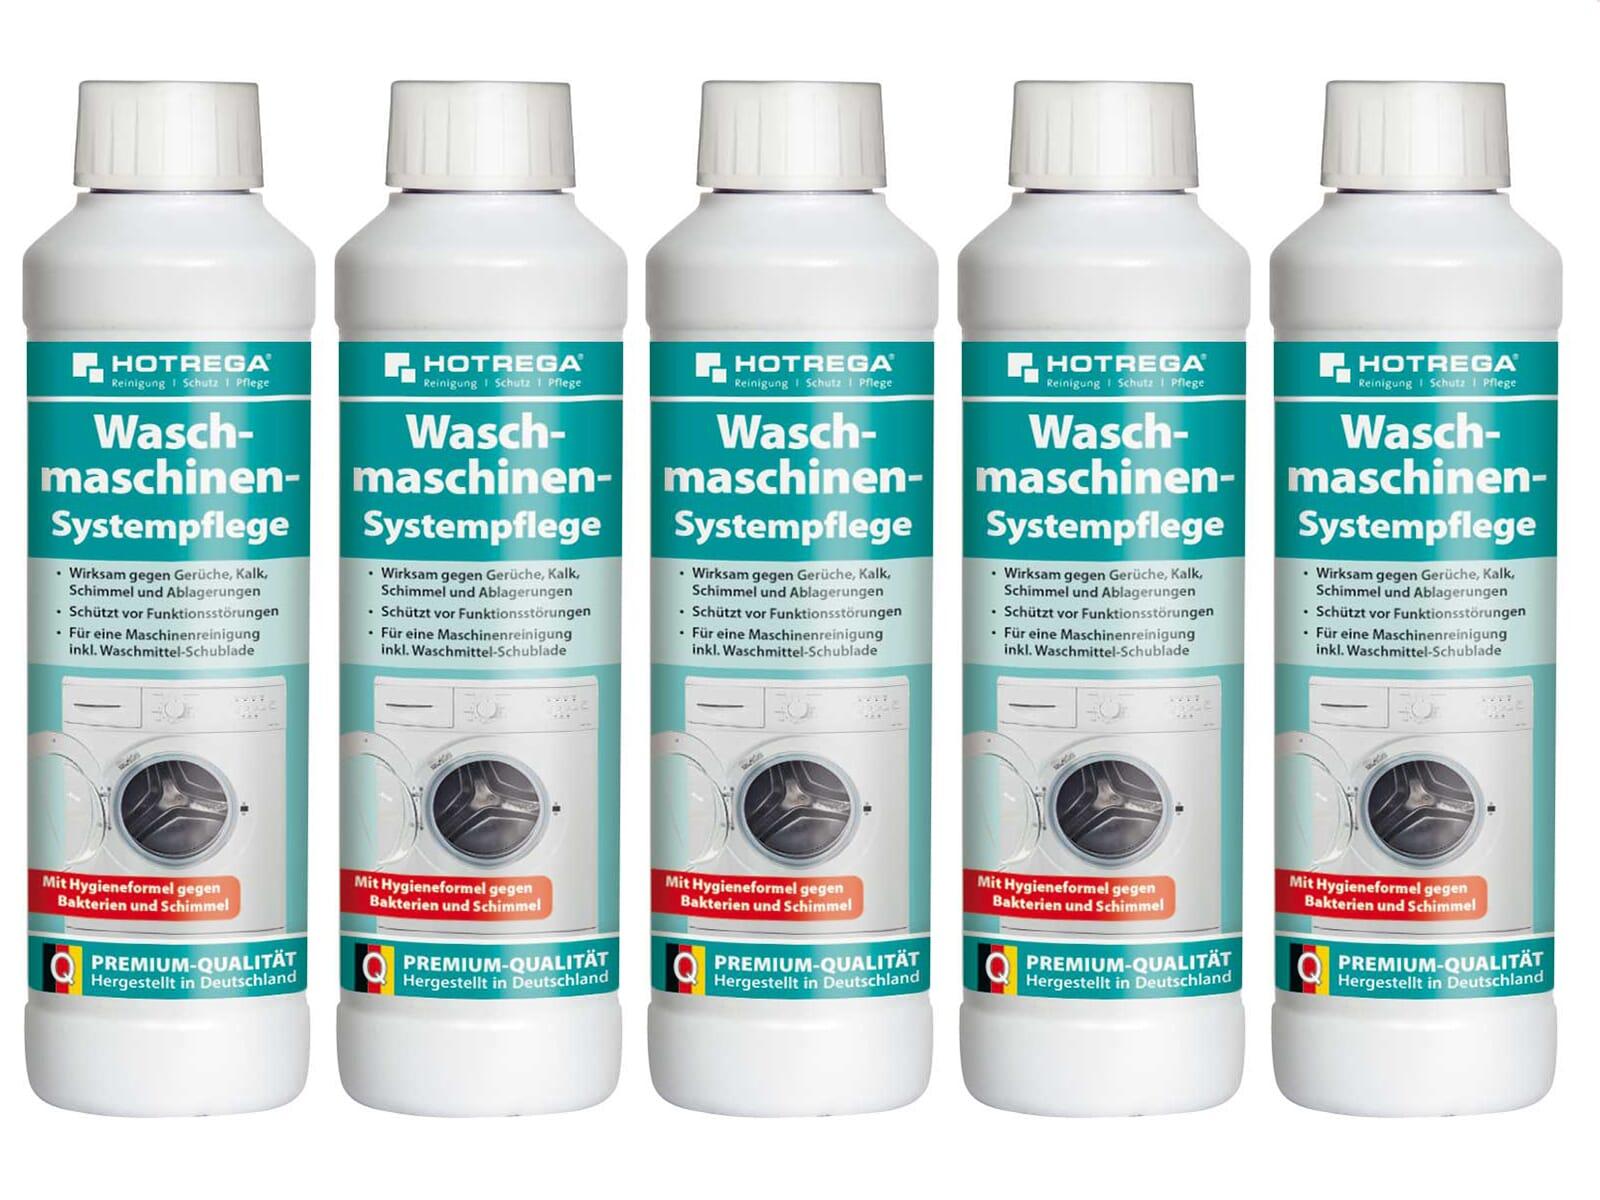 Hotrega H110290 Waschmaschinen-Systempflege - 5er Set